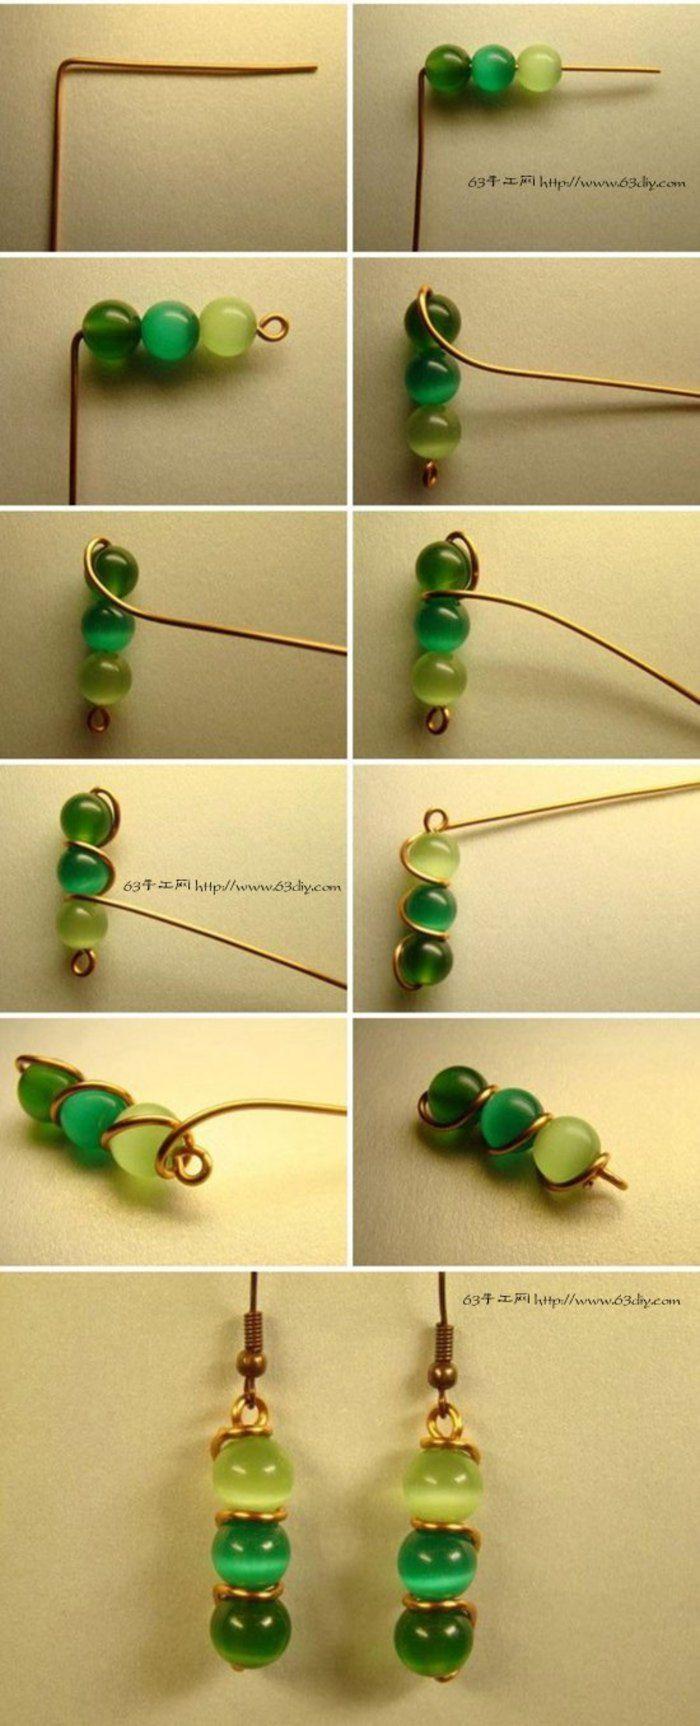 Green Bead Earrings...♥ Deniz ♥